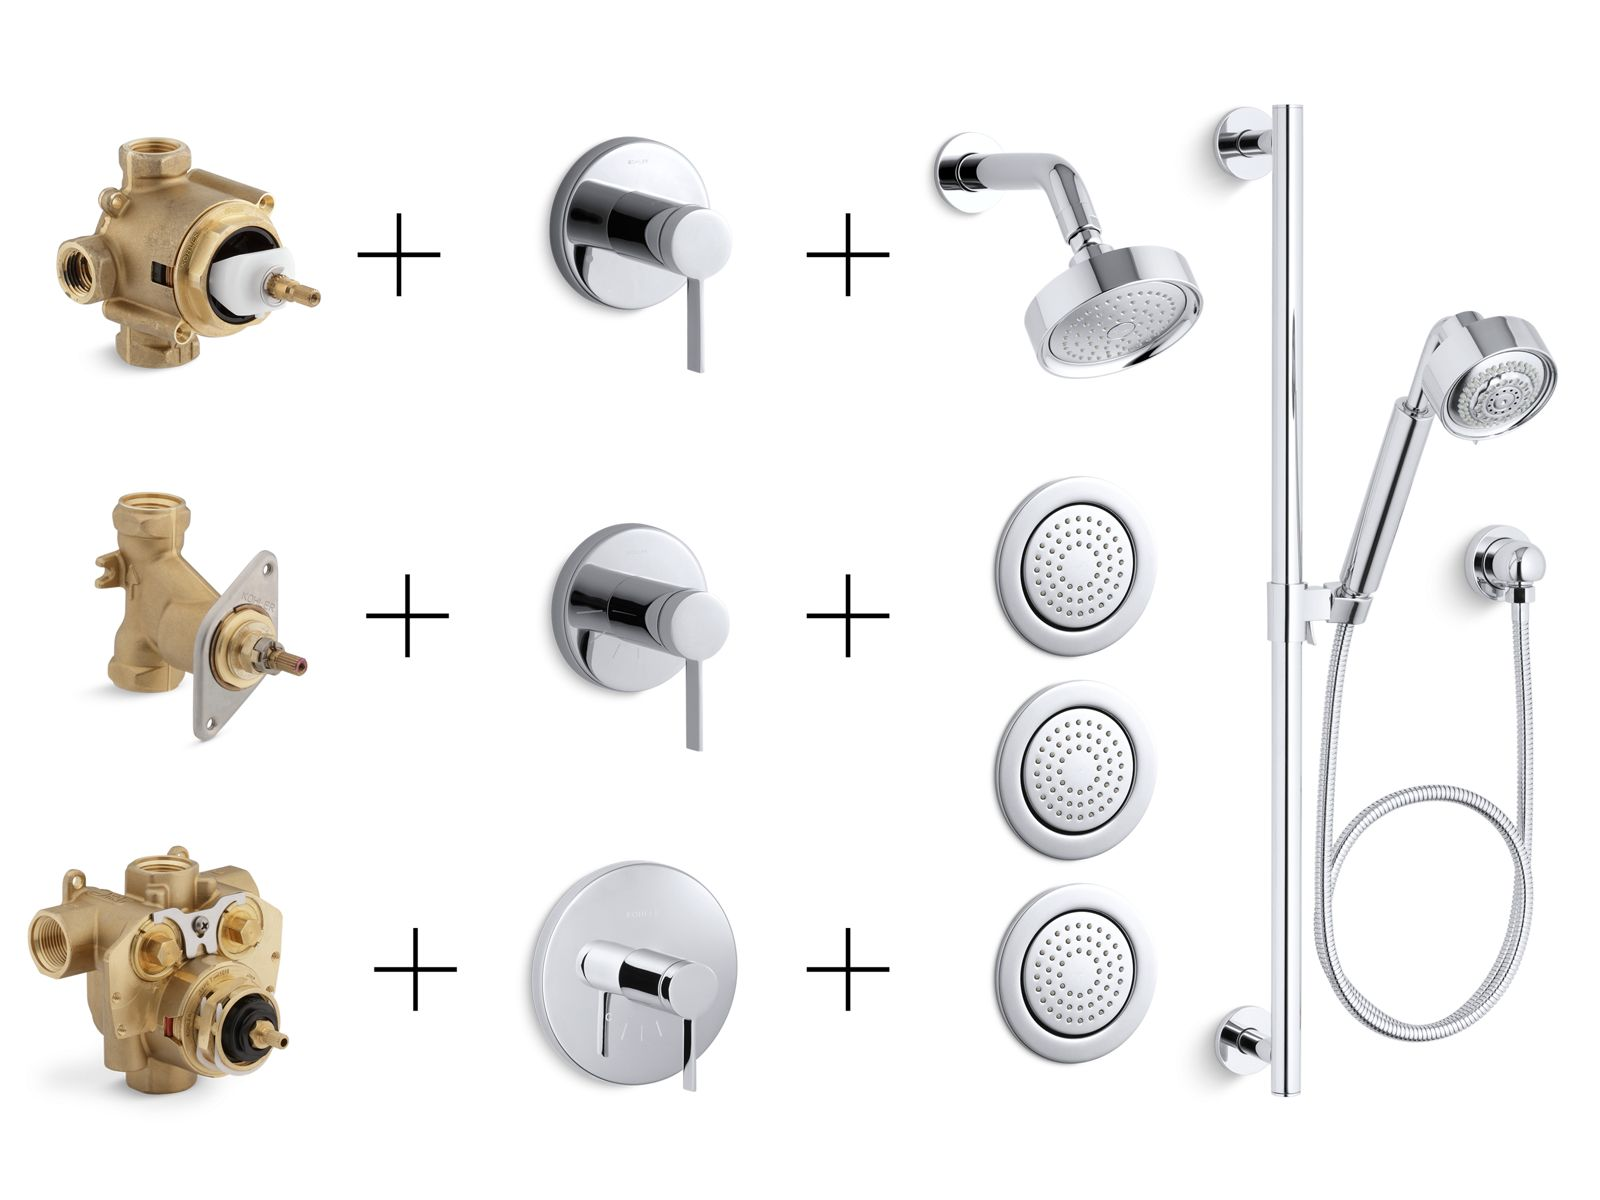 shower valves trims controls guide